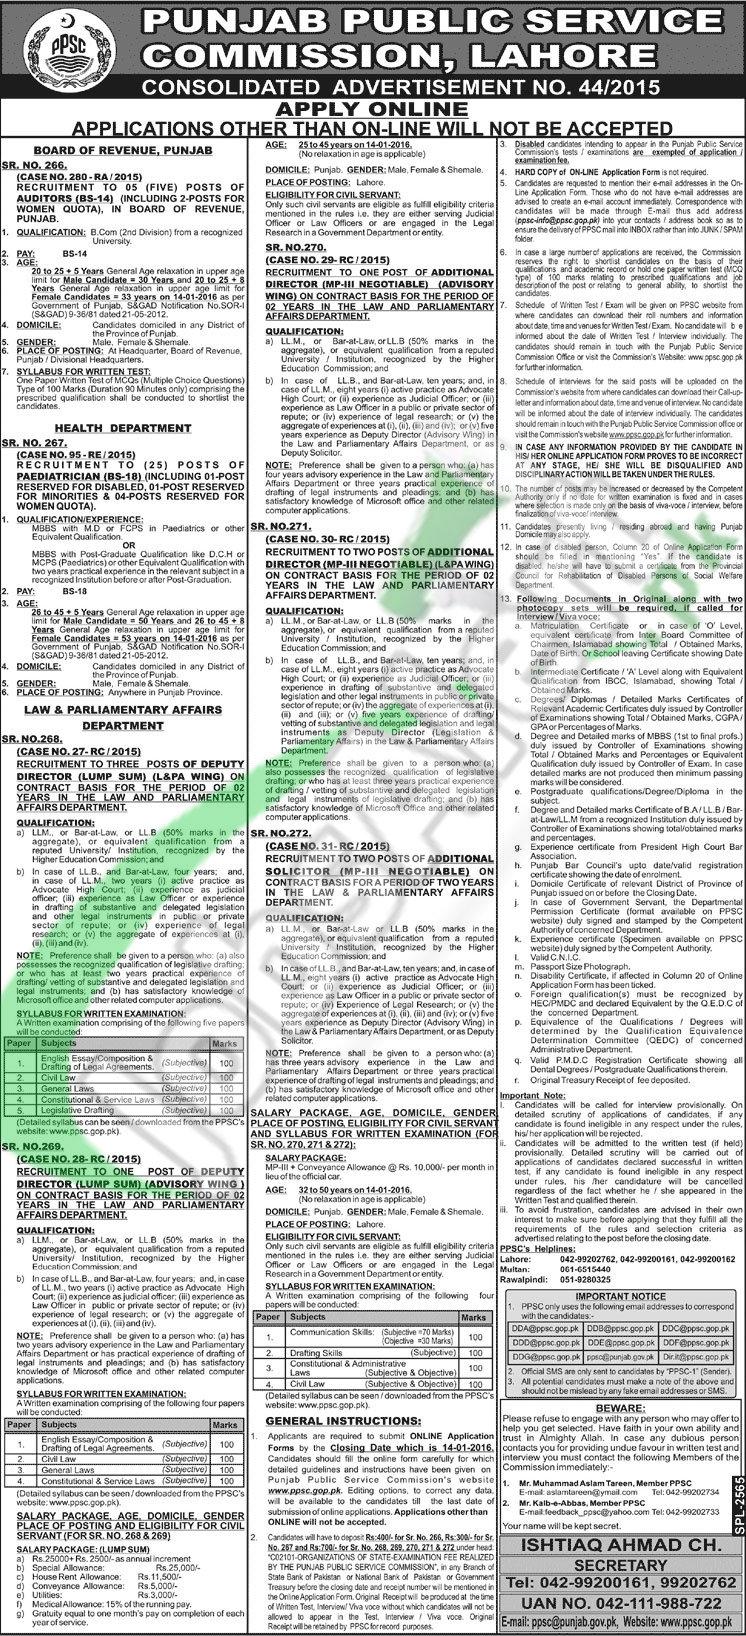 Recruitment Opportunities in Punjab Public Service Commission Lahore 2016